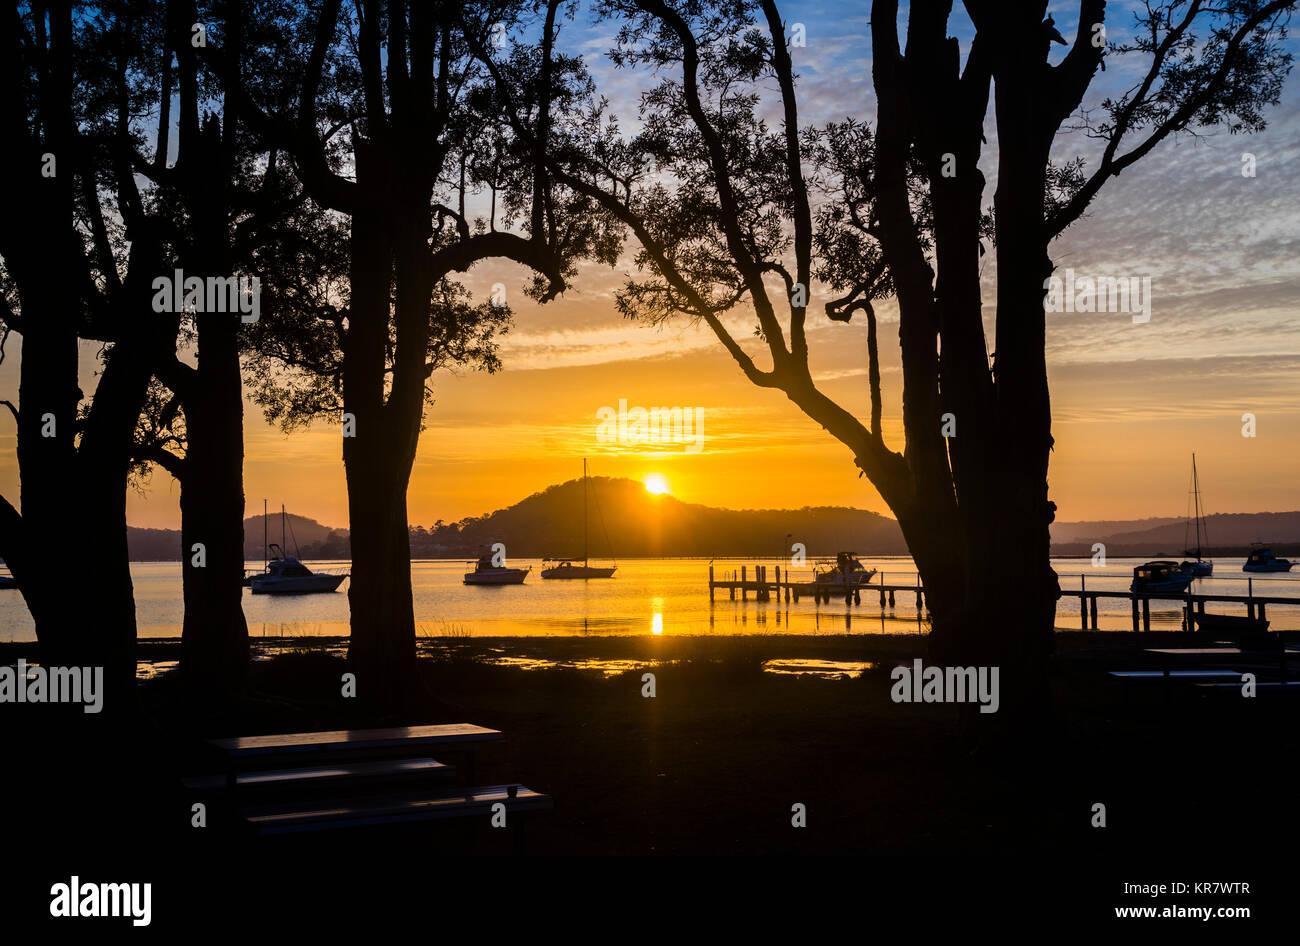 Australia, New South Wales, Central Coast, Brisbane Water, Cooch Park, Koolewang, sunrise over Mount Pleasant Brisbane - Stock Image